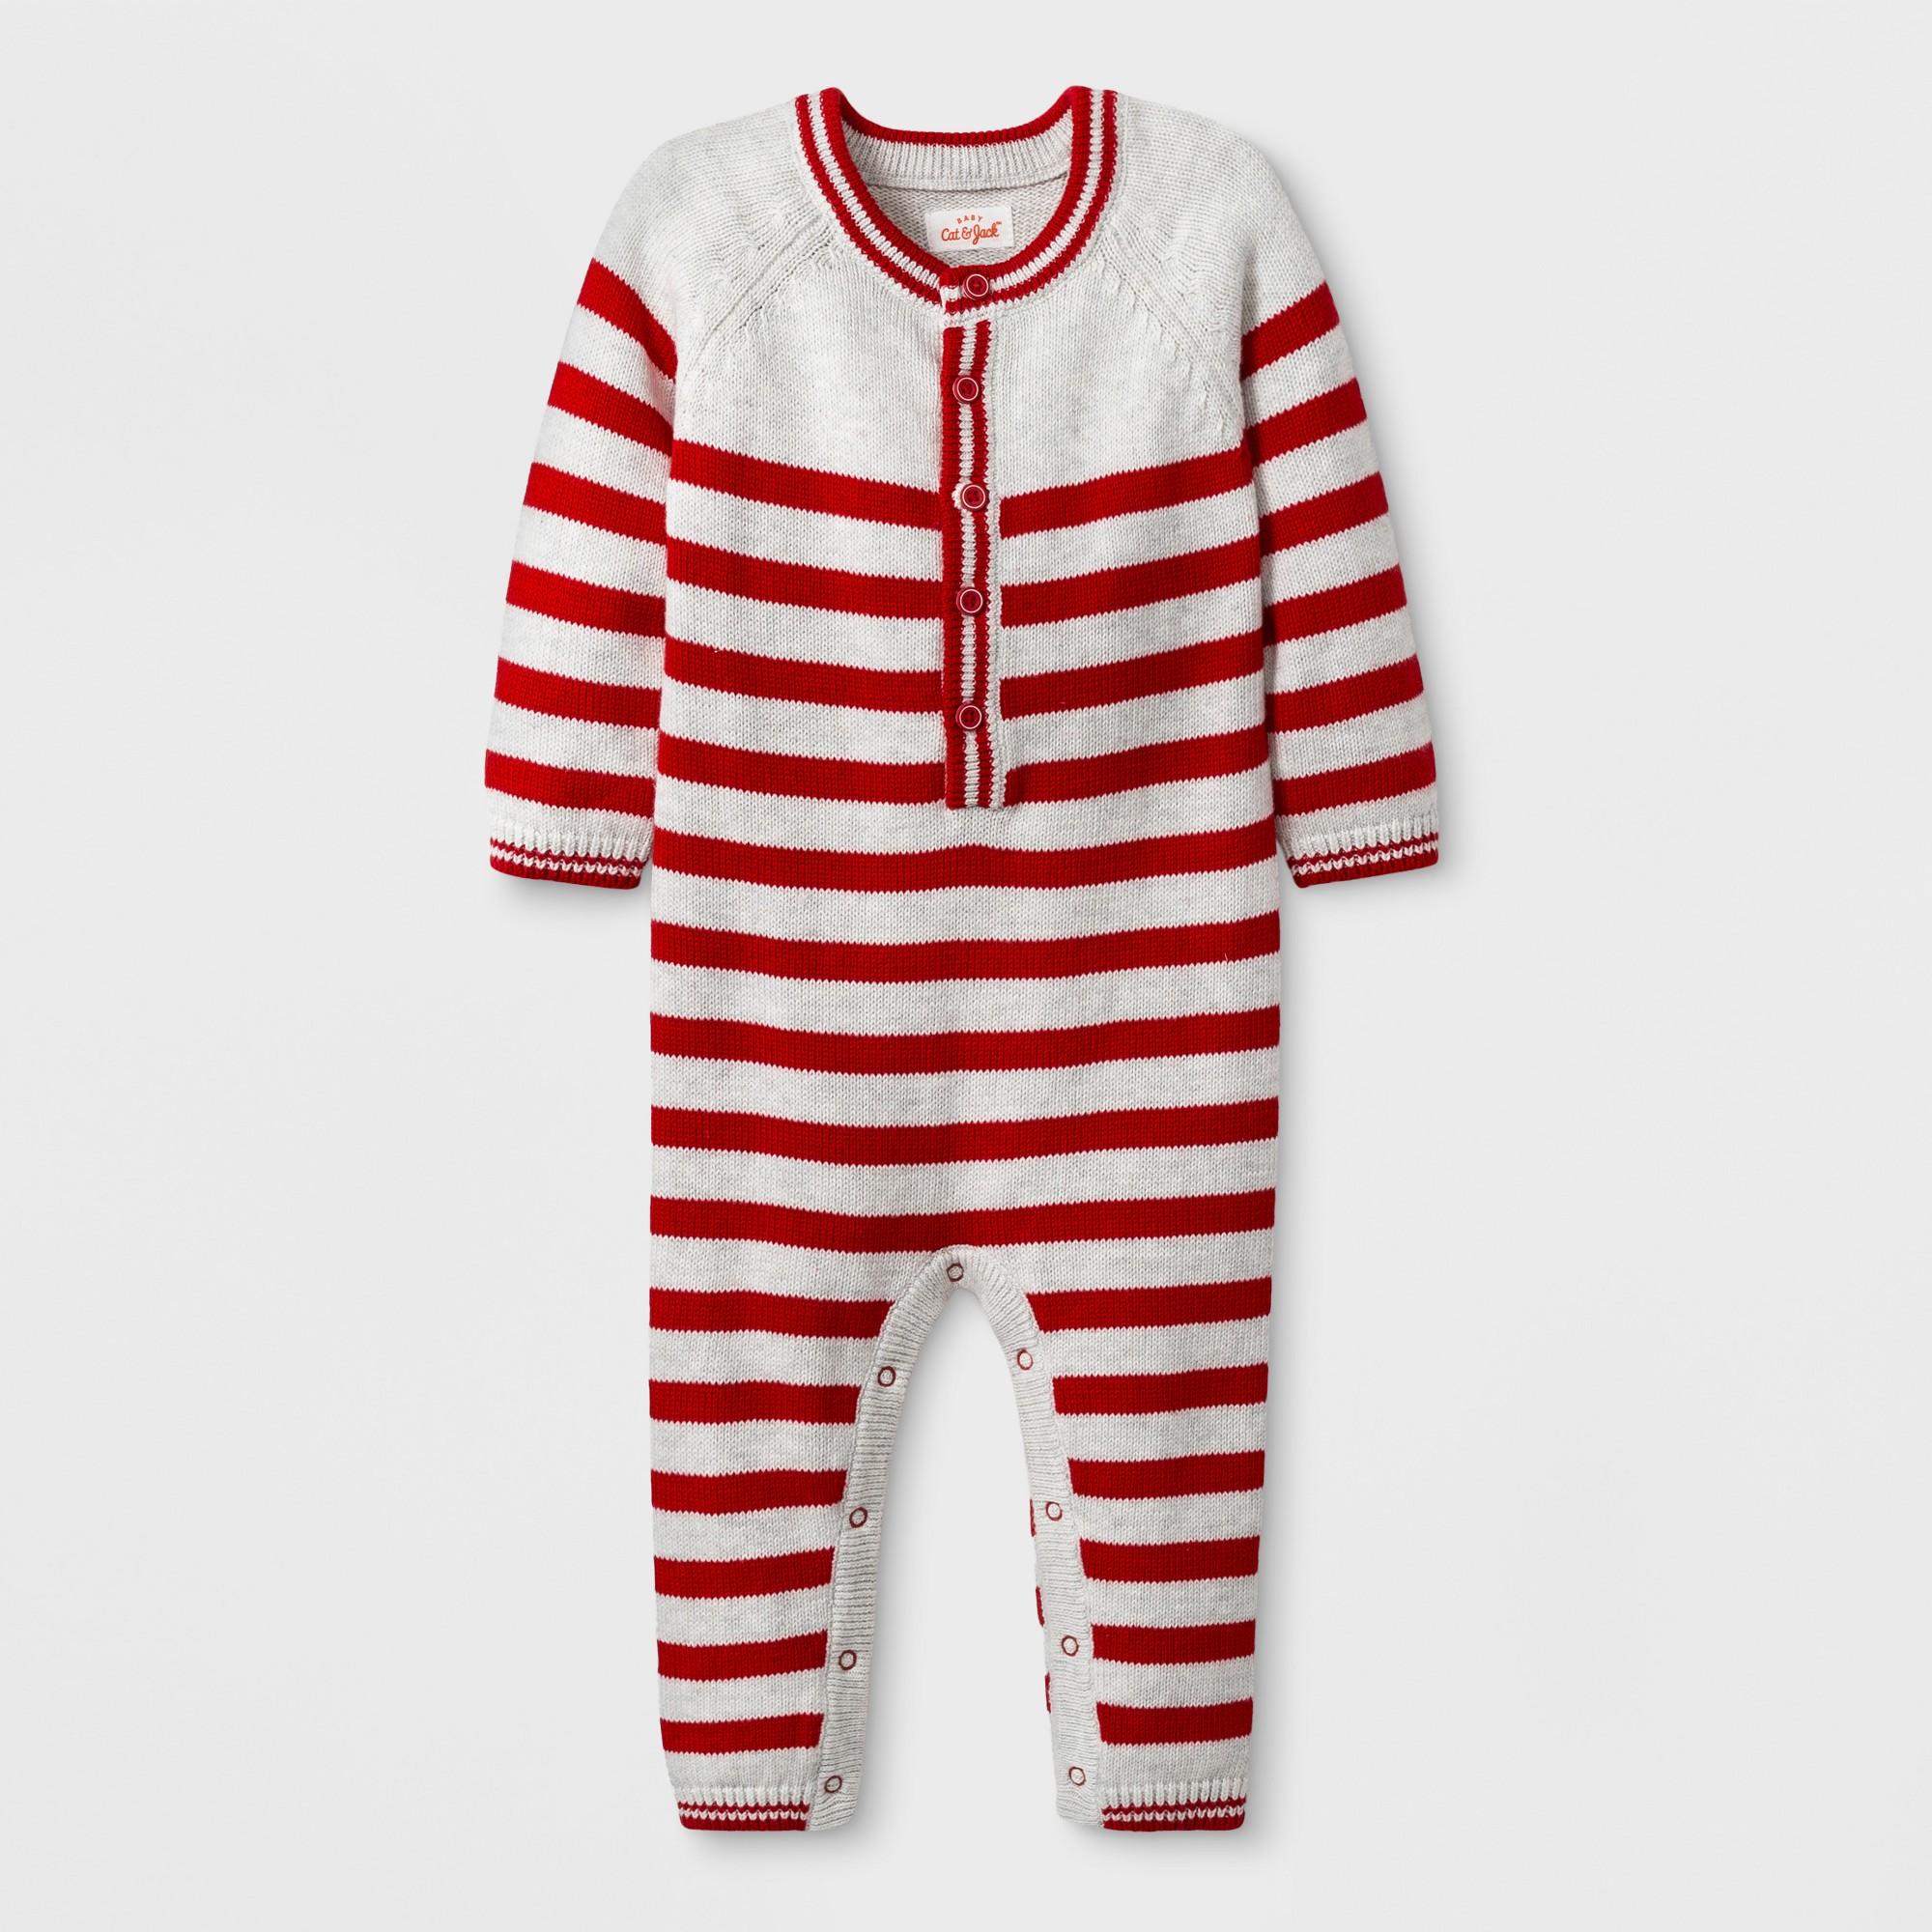 6fd5daa786ea Baby Boys  Holiday Sweater Stripe Romper - Cat   Jack Red Newborn ...